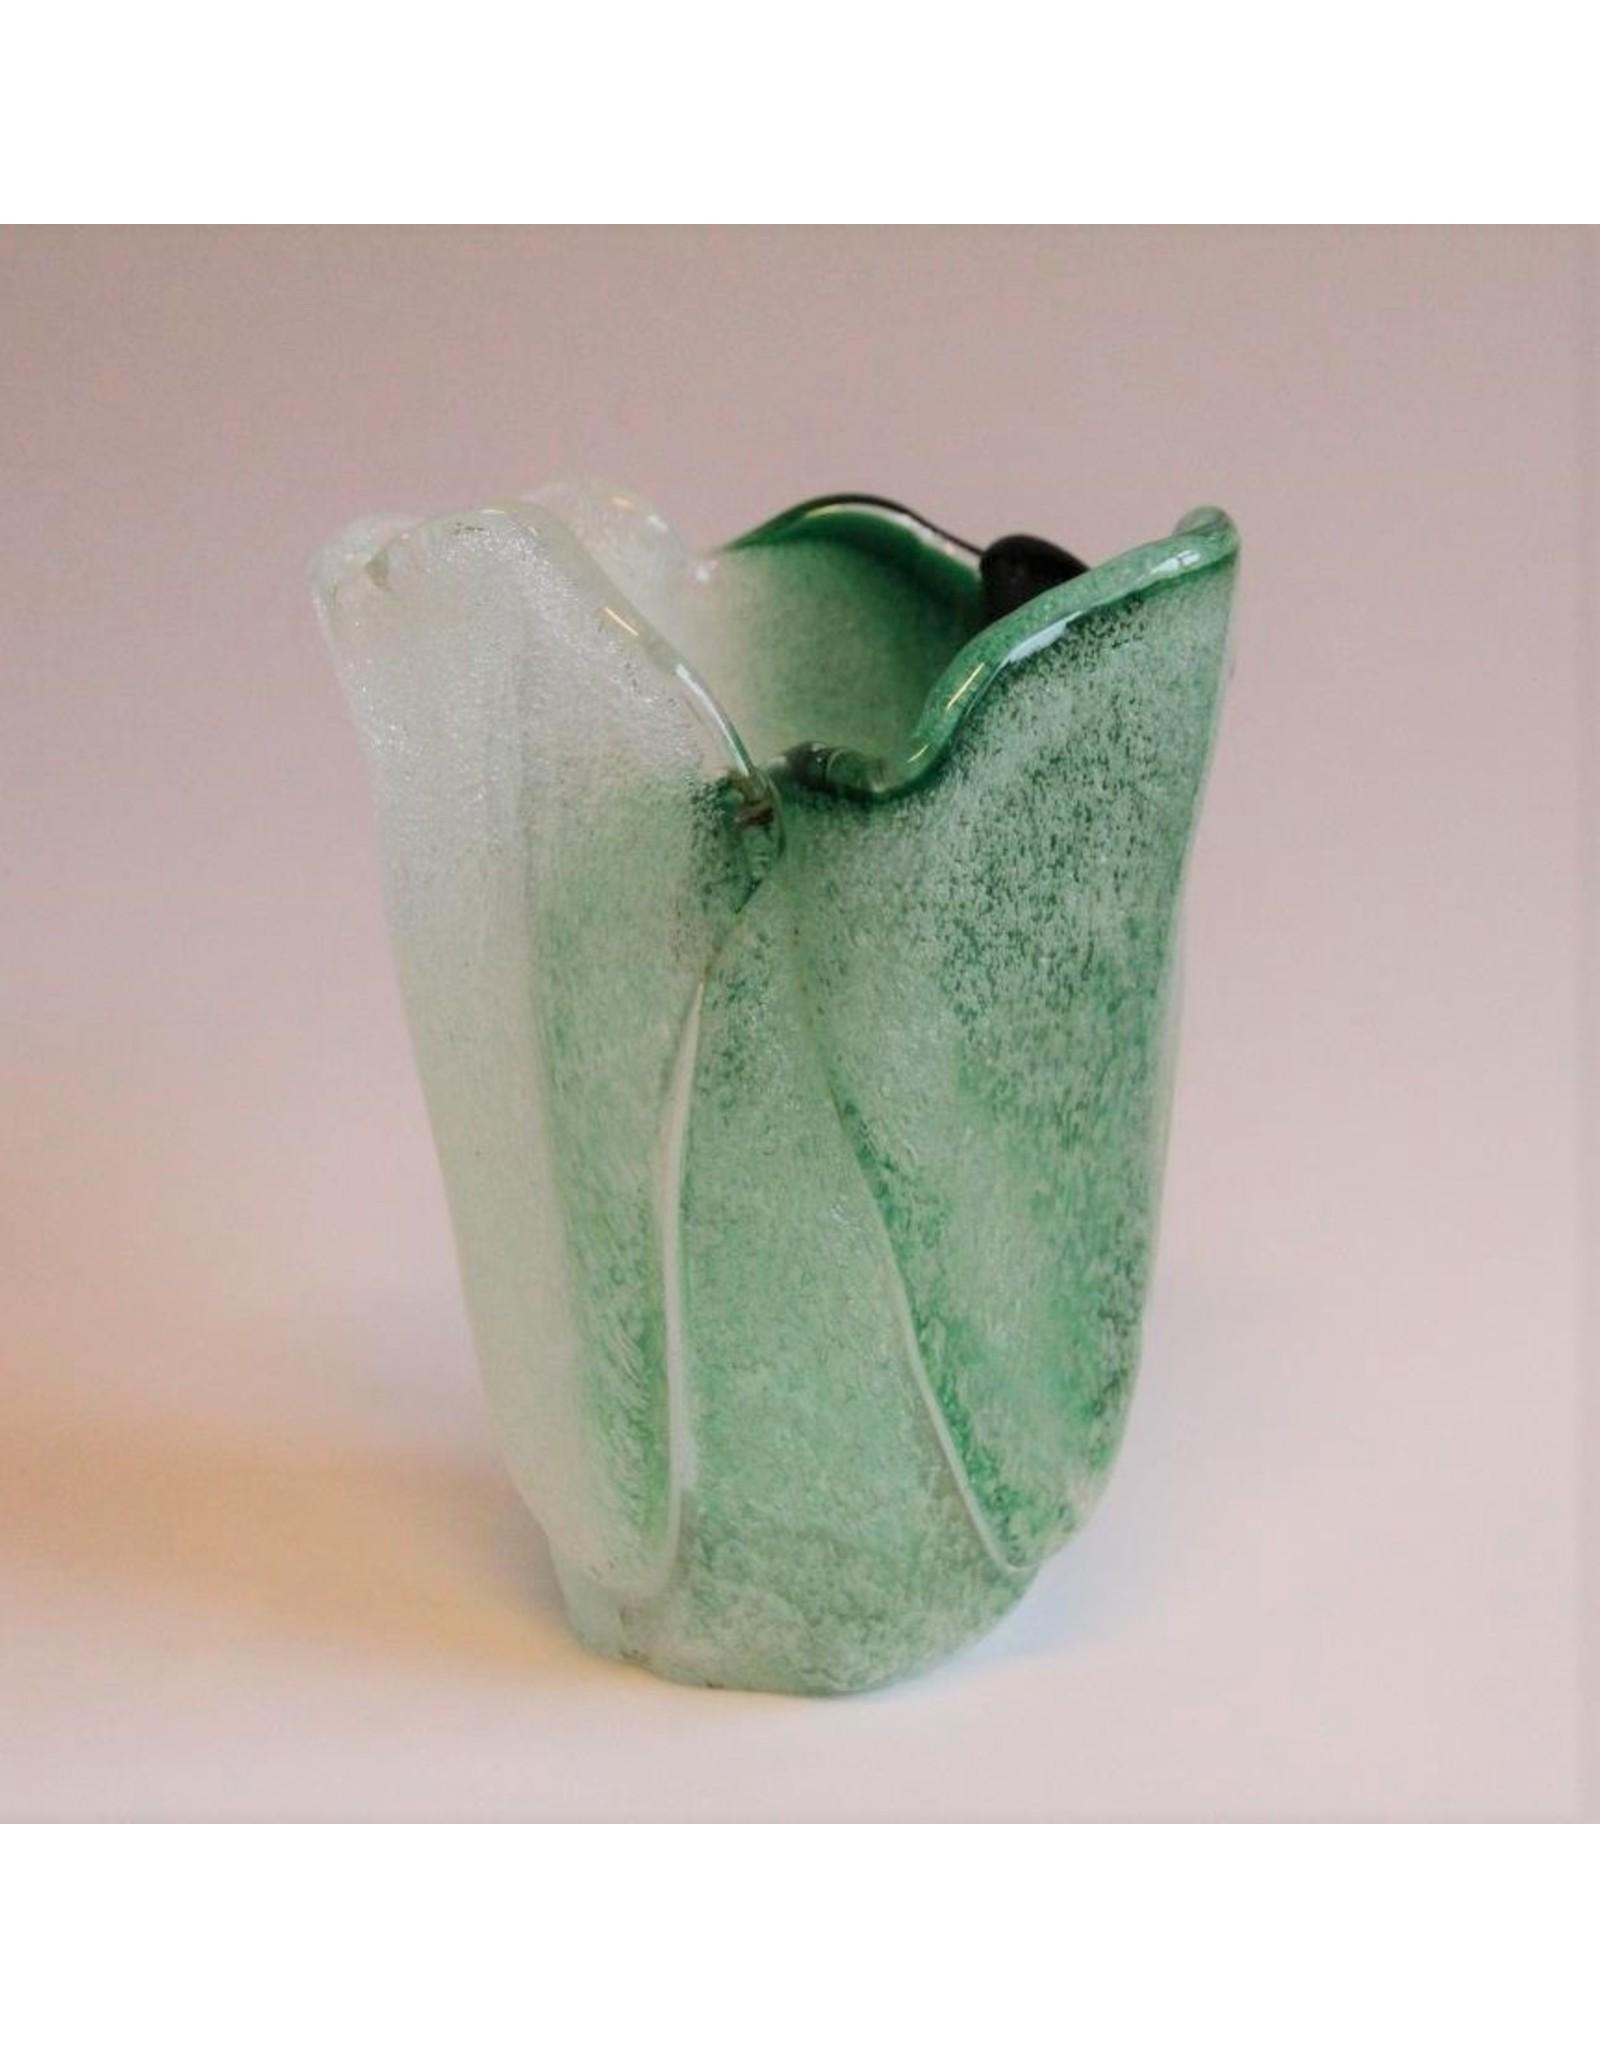 Vase - art glass, green & white, bubbled